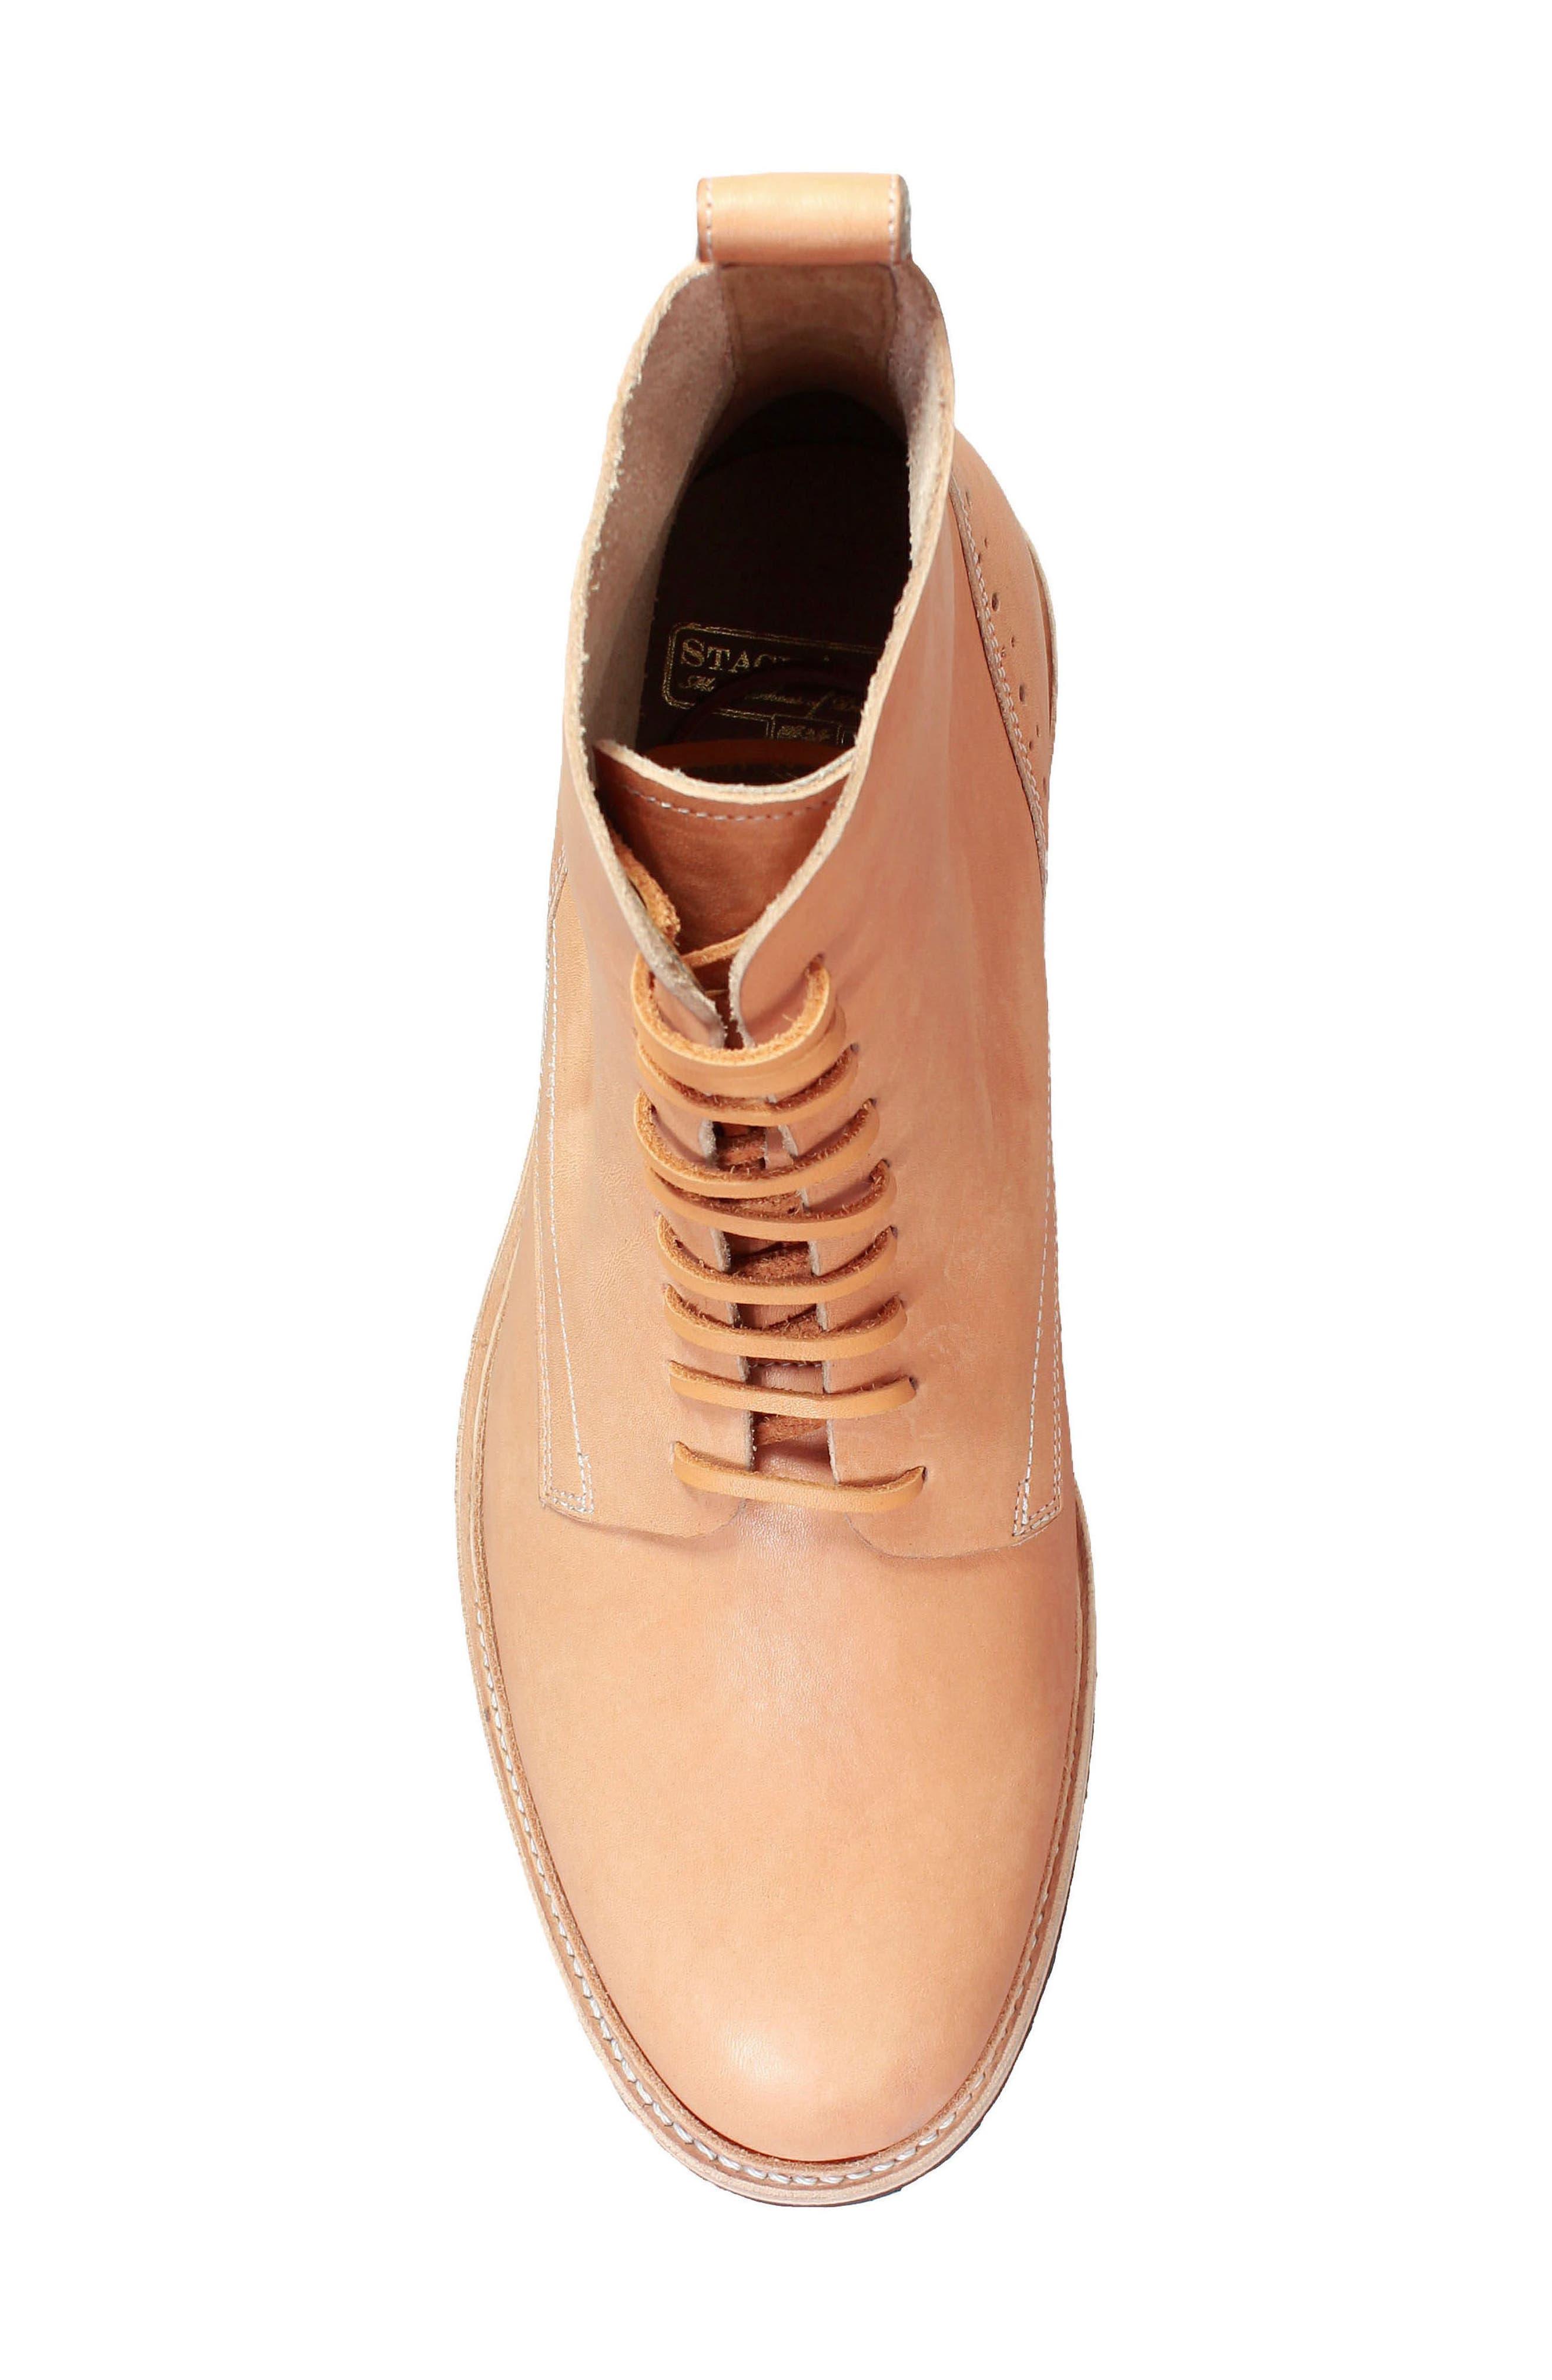 M2 Plain Toe Boot,                             Alternate thumbnail 5, color,                             Natural Leather